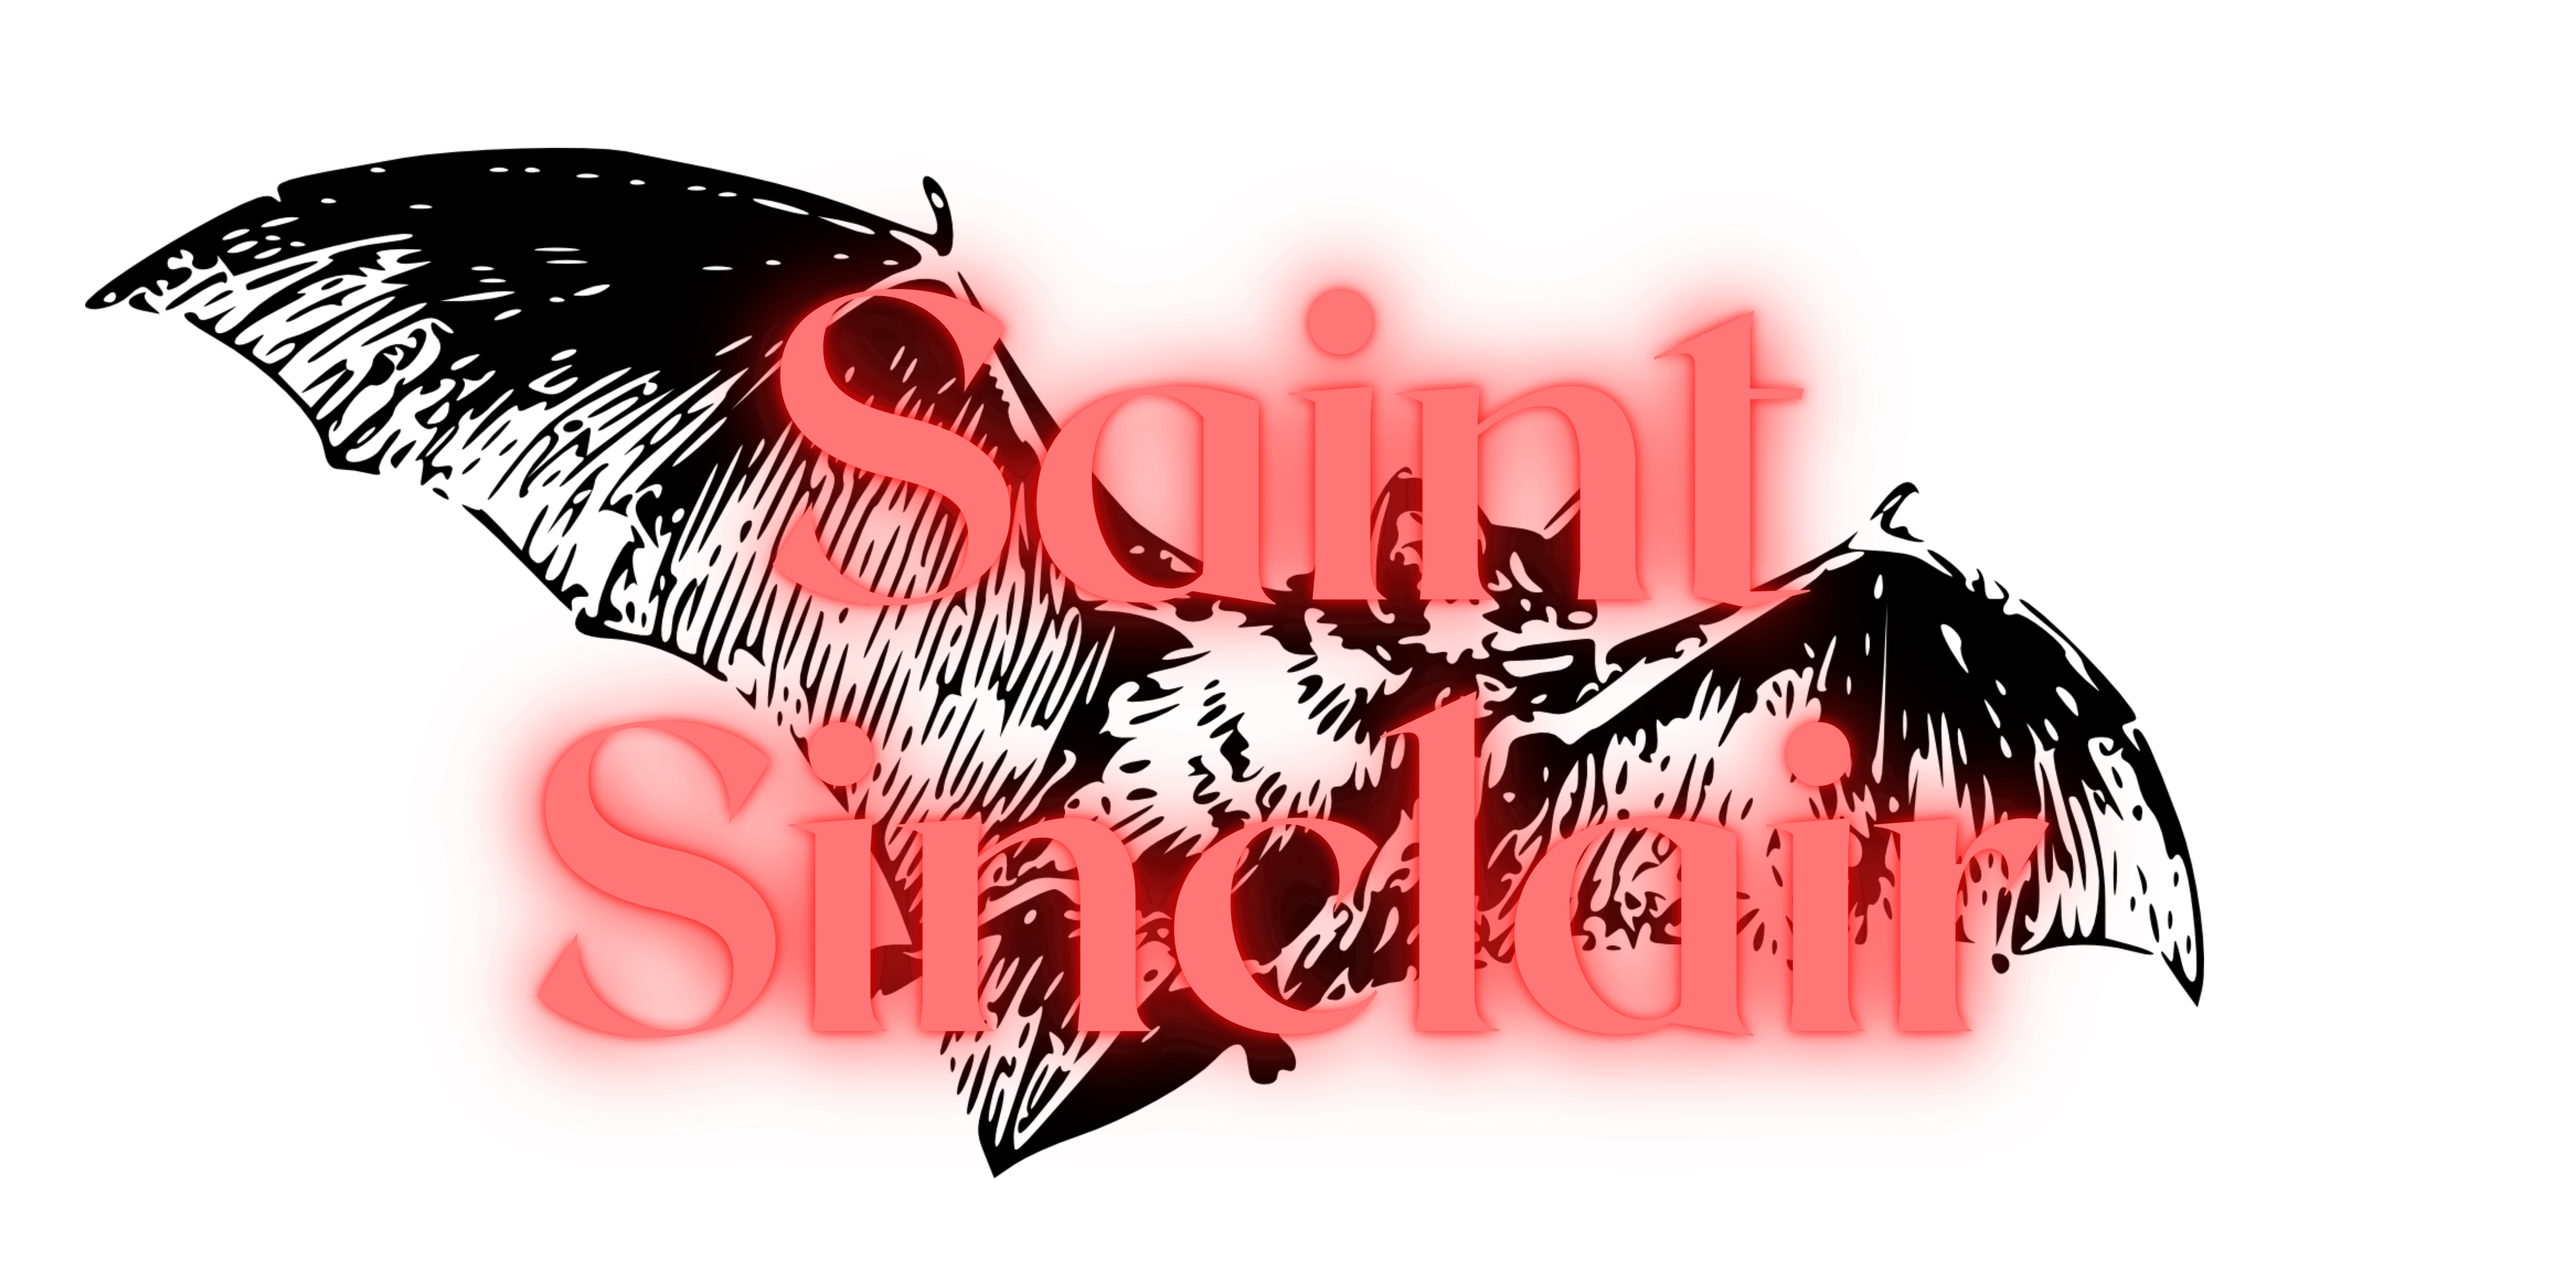 Saint Sinclair bat sketch